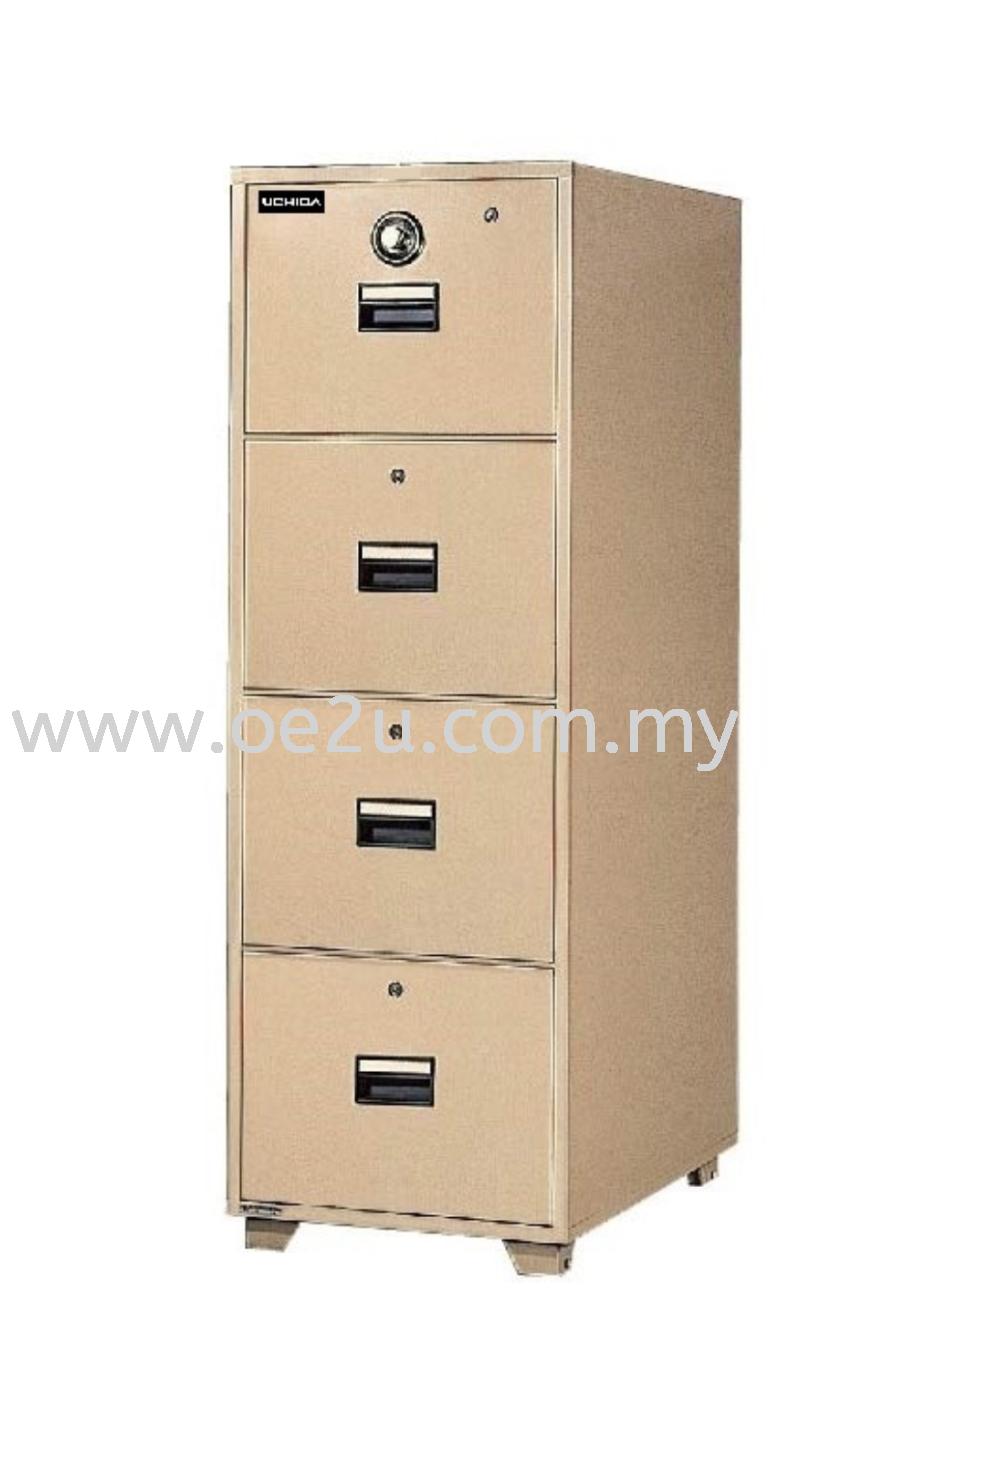 UCHIDA 4 Drawer Fire Resistant Filing Cabinet (B4-4D)_340kg